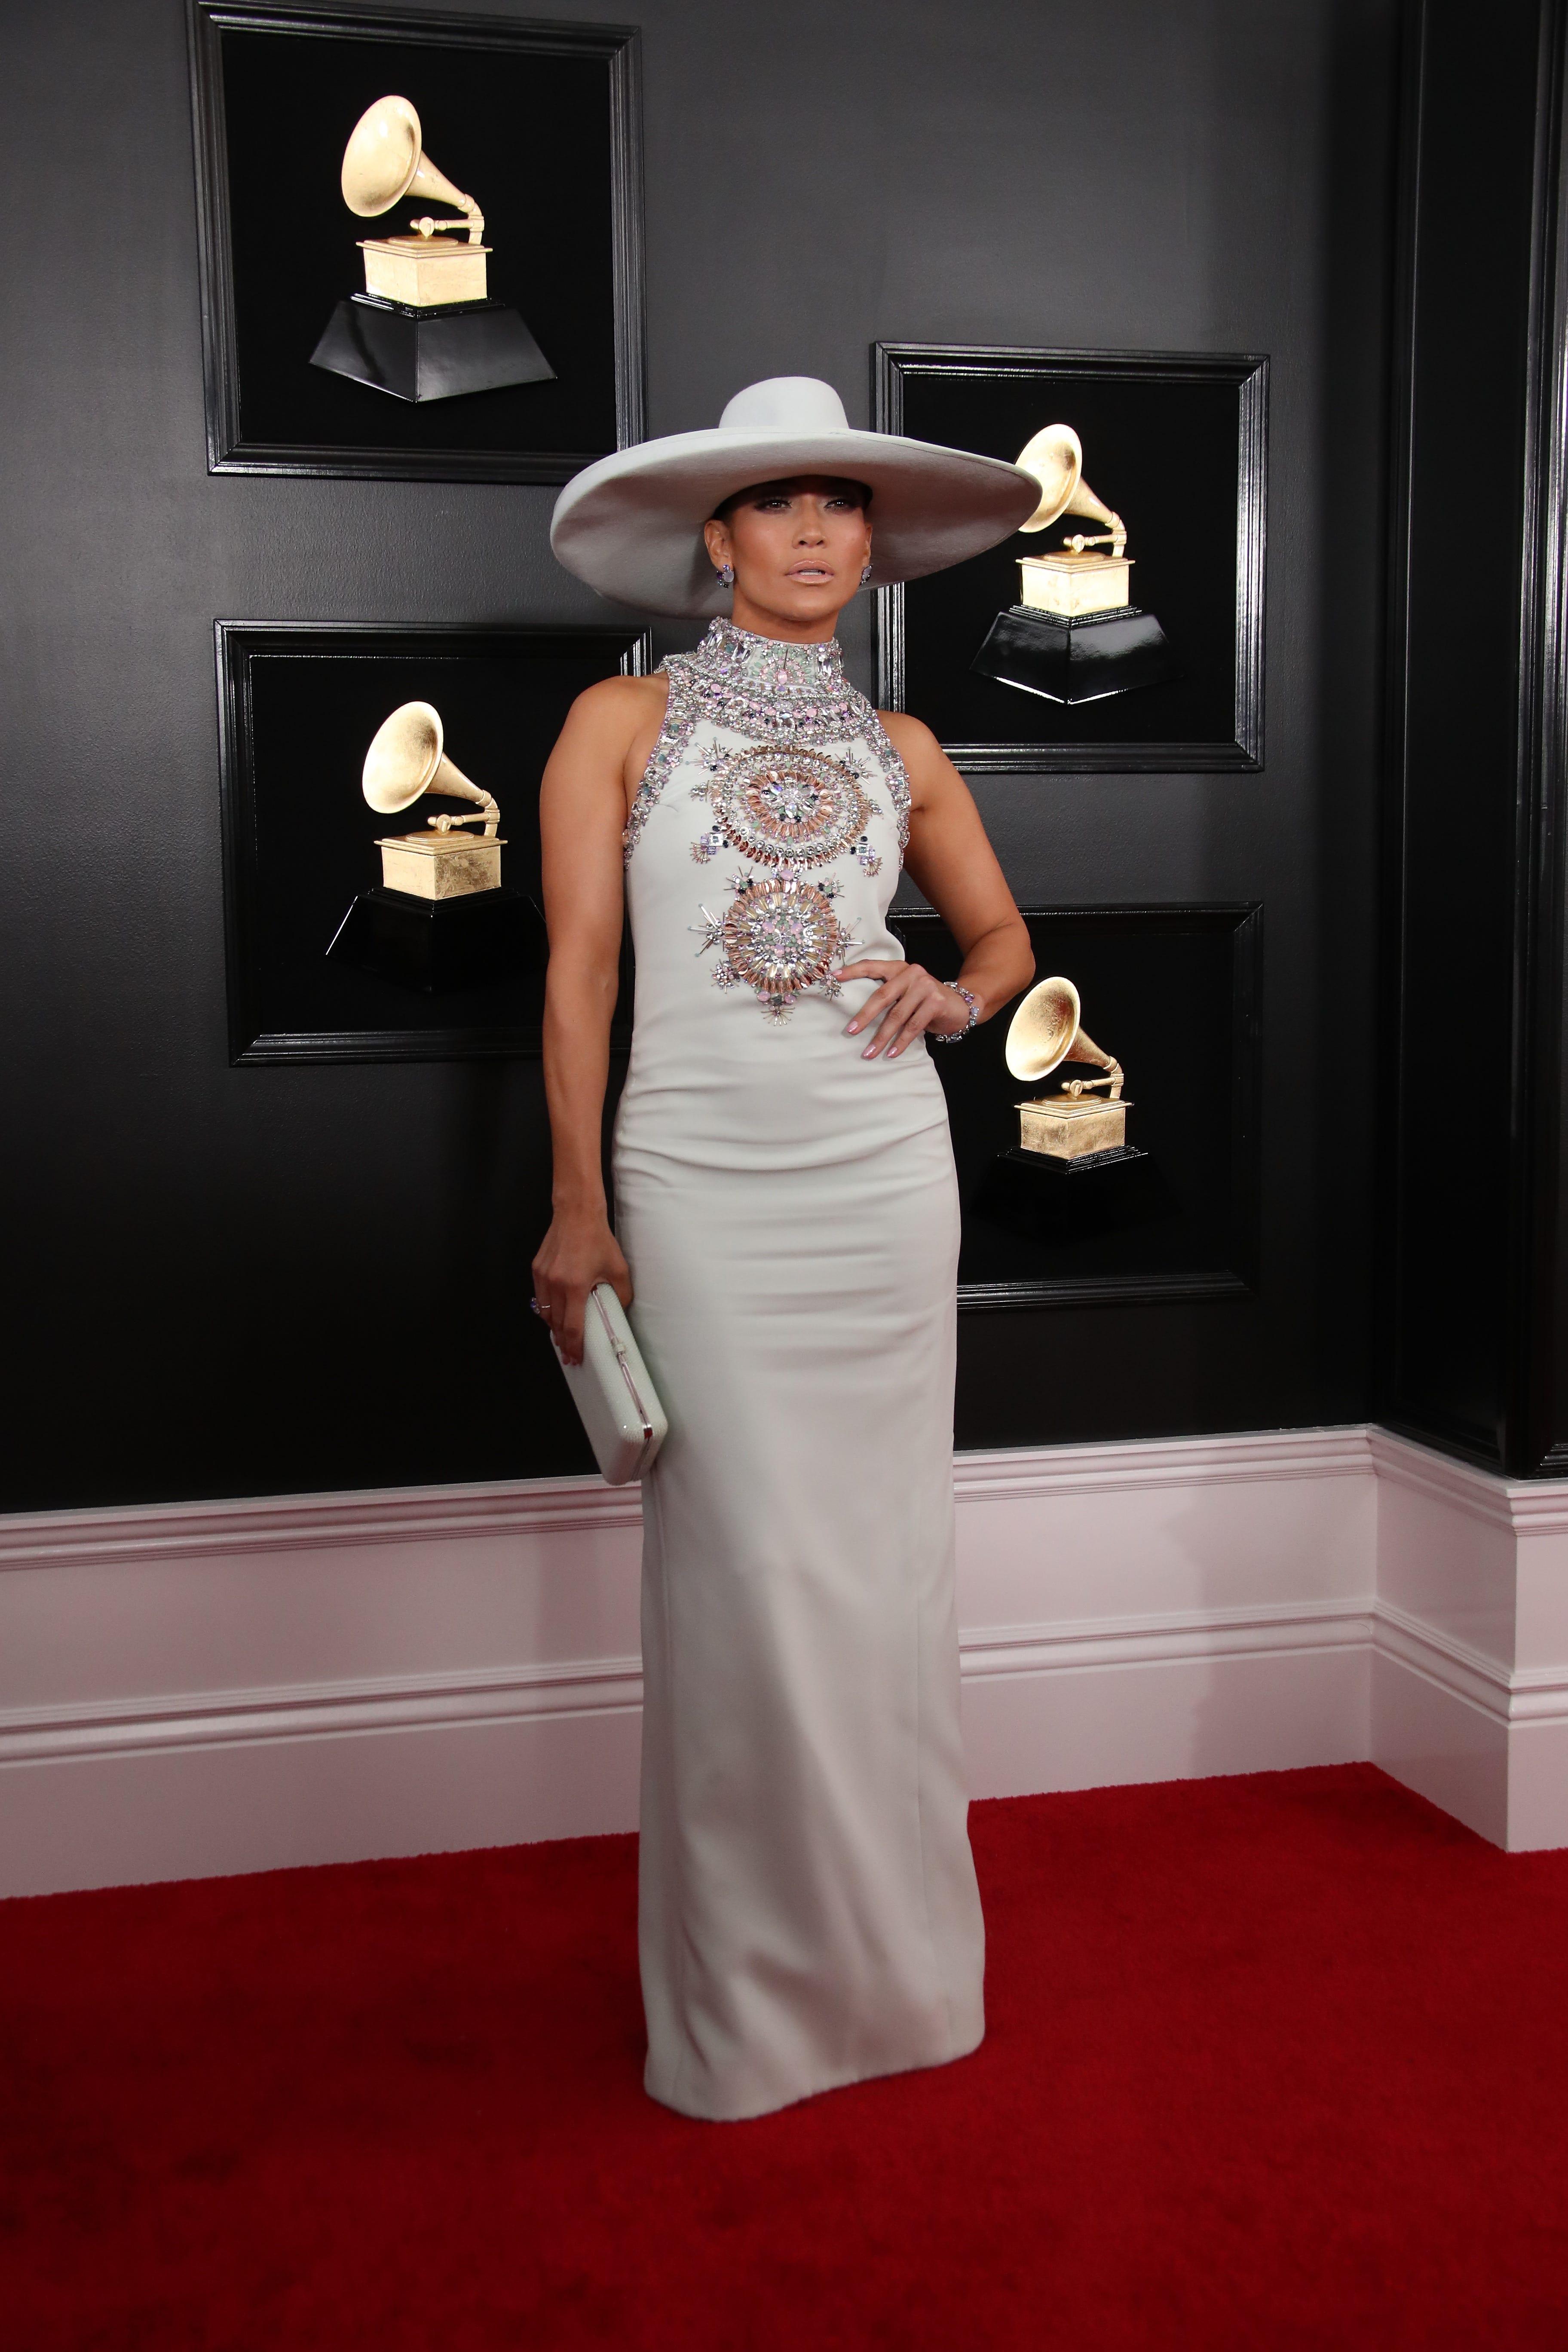 Grammys 2019: The worst-dressed stars from Jennifer Lopez to Kylie Jenner